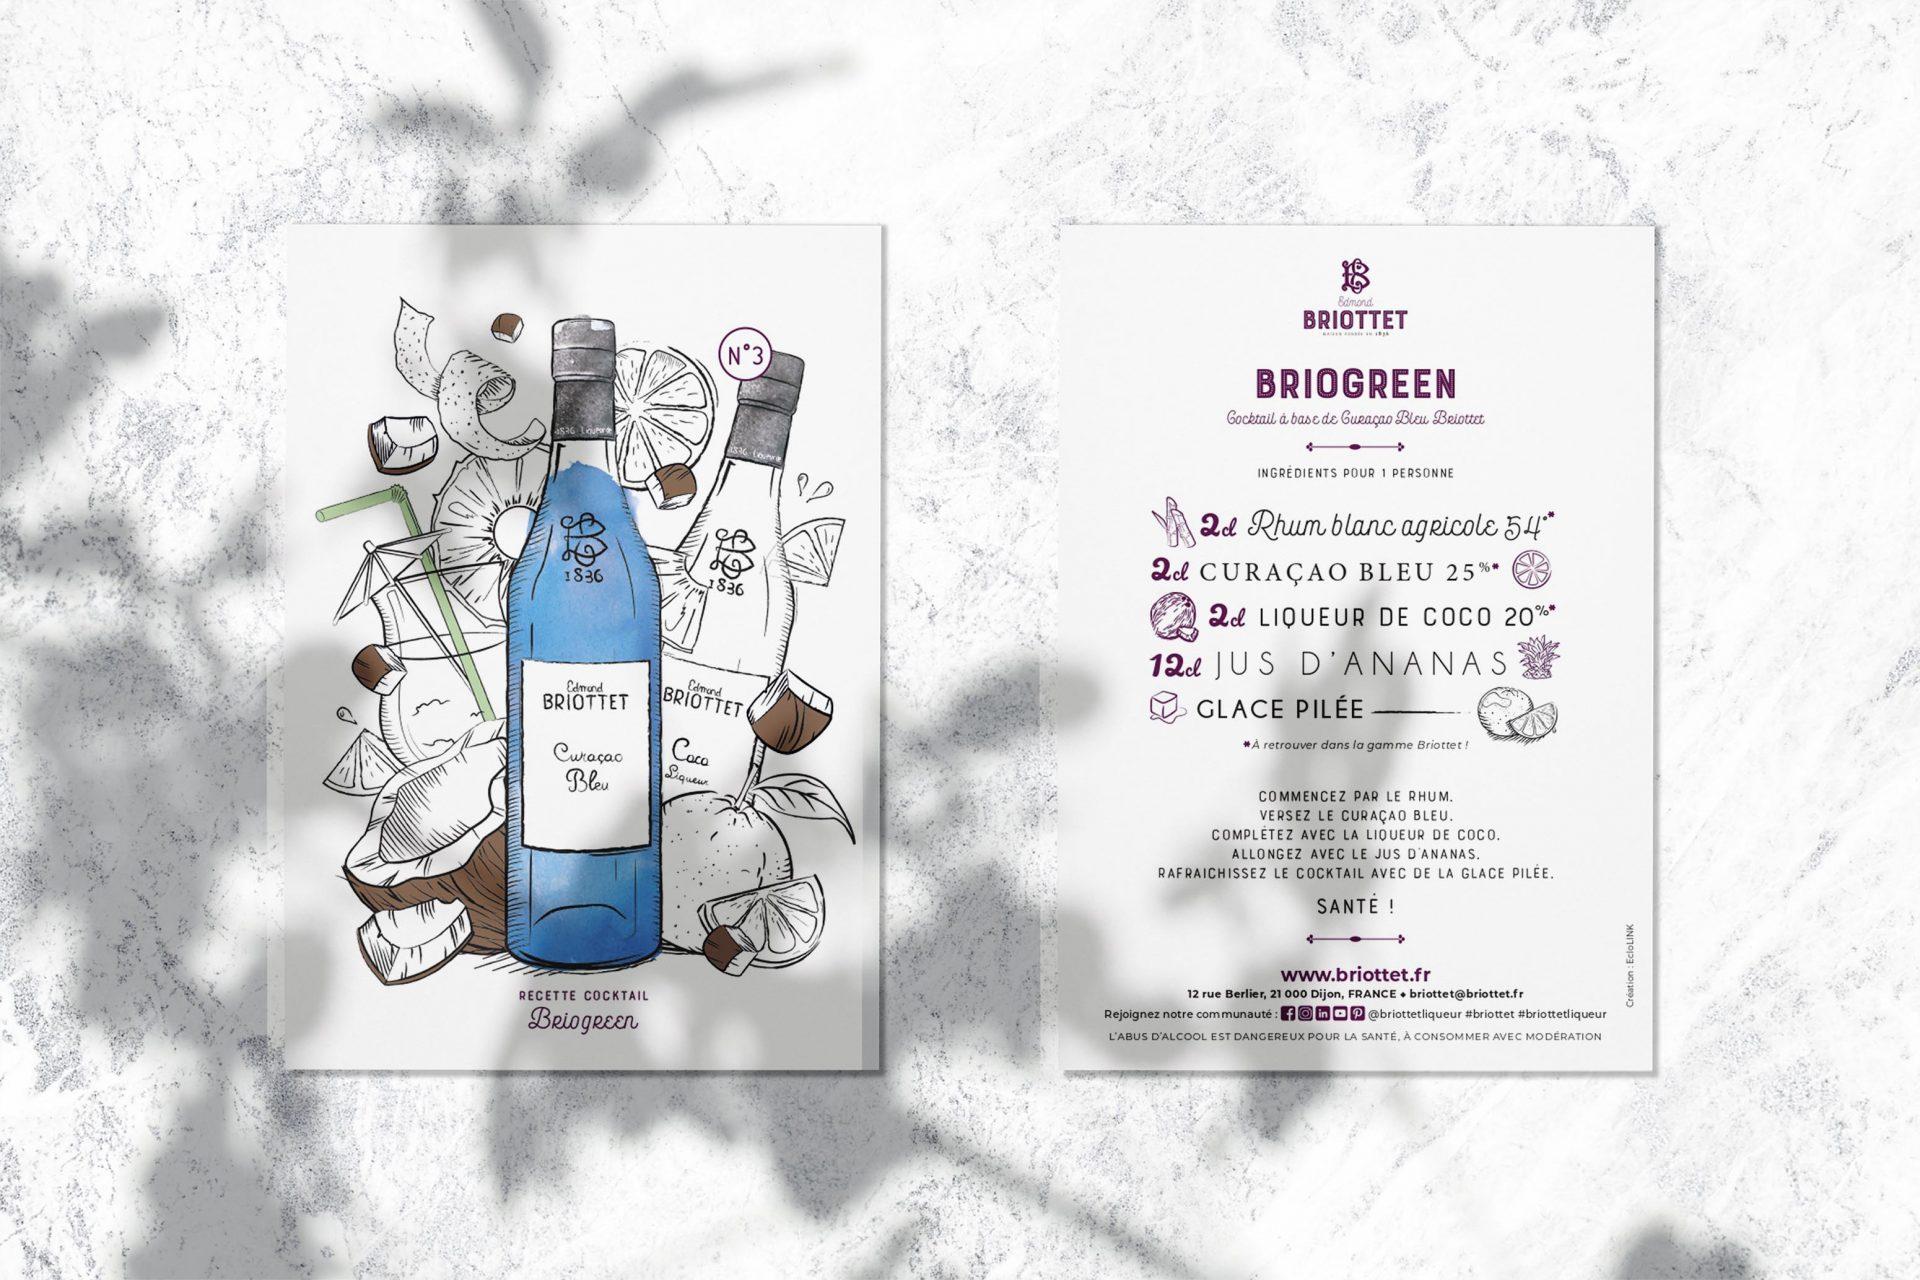 Carte recettes N°3 Briogreen cocktail à base de Curaçao Bleu Briottet